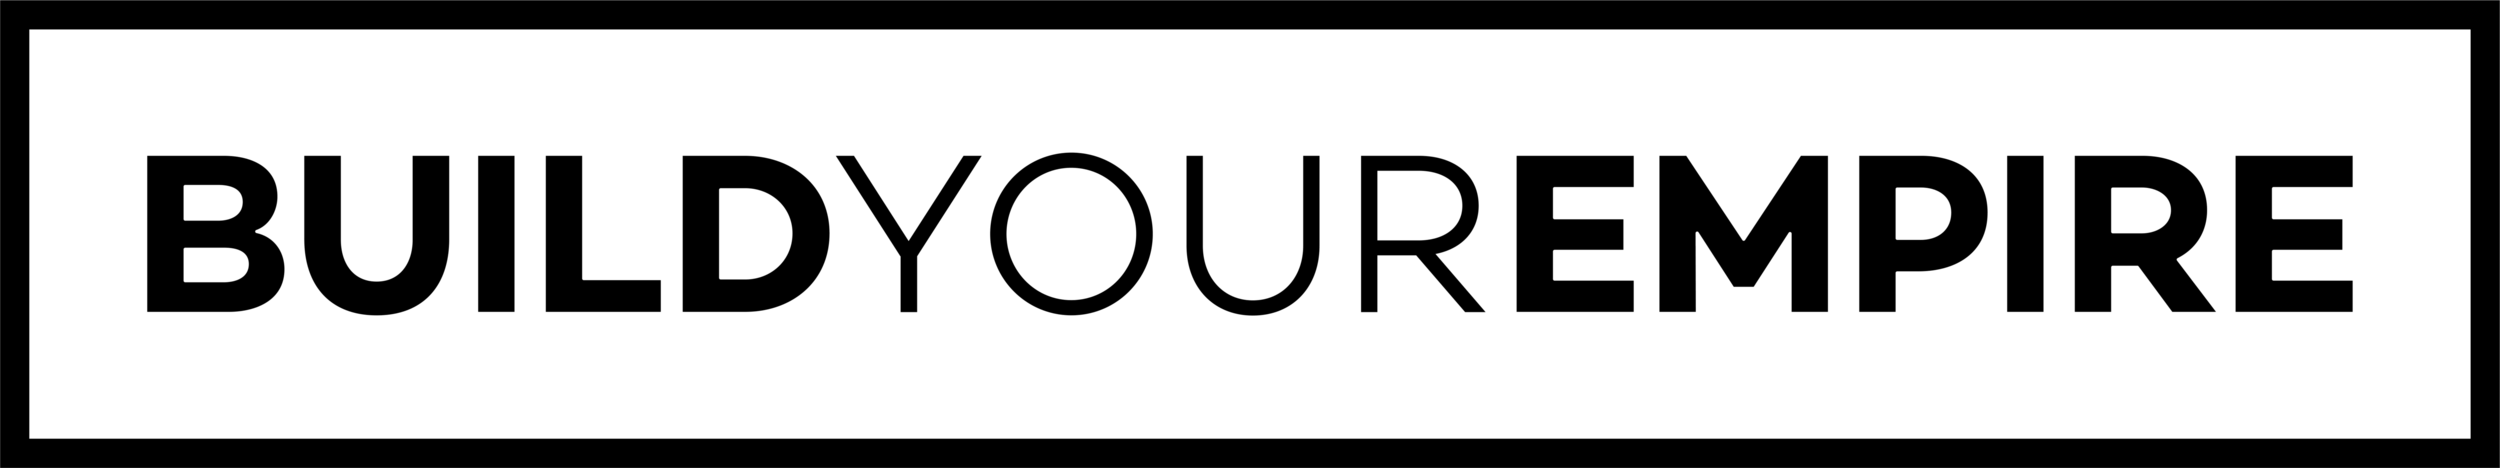 build-your-empire-logo-black.png